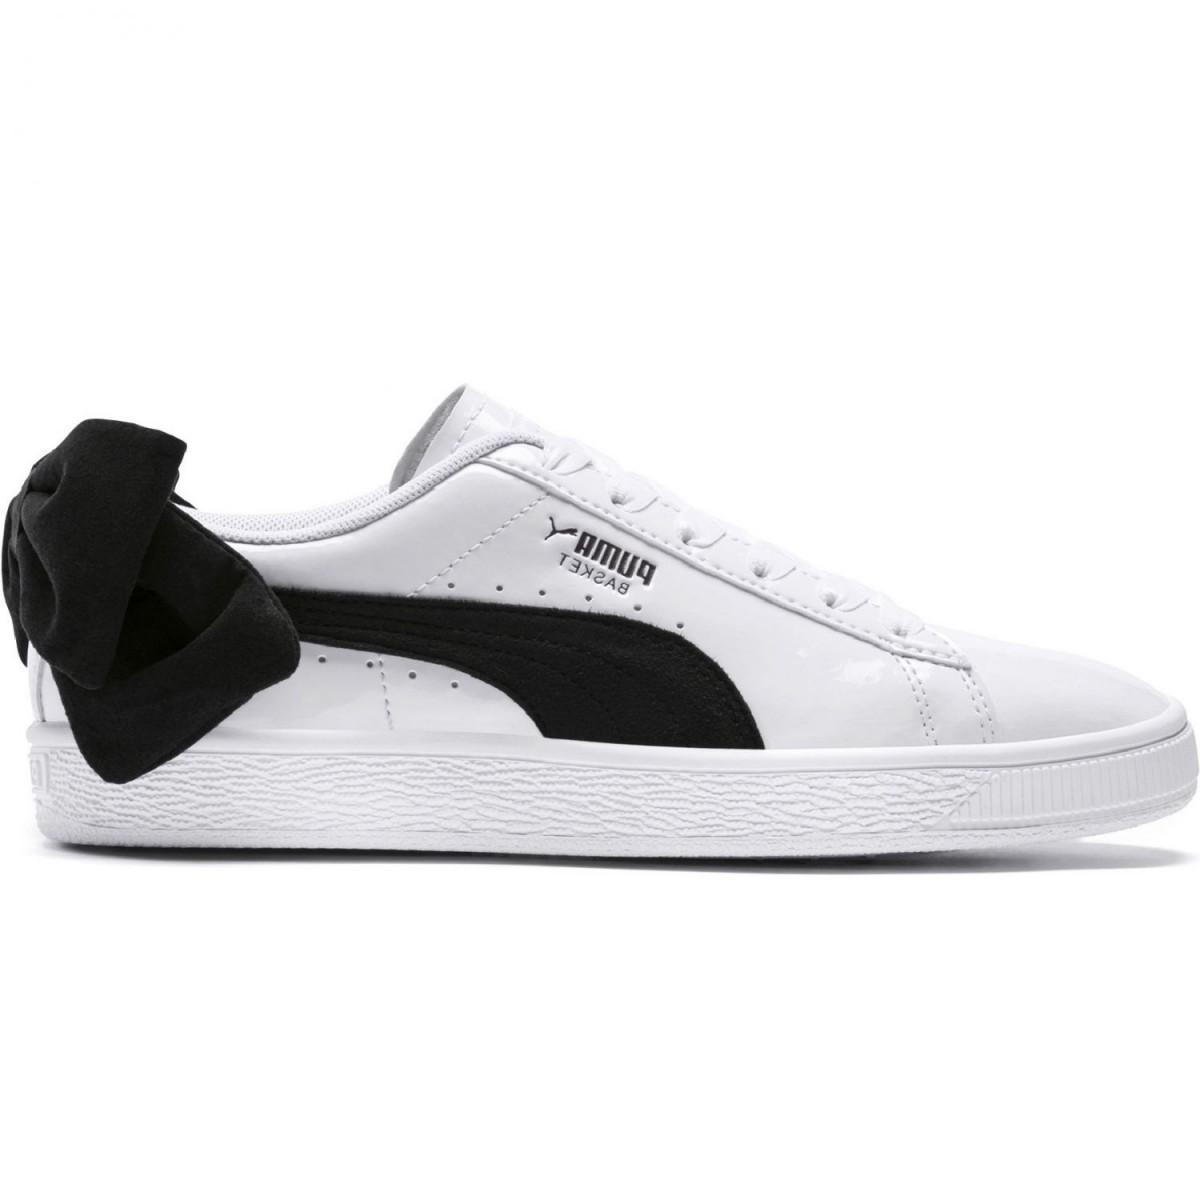 Puma Basket Bow SB Sneaker